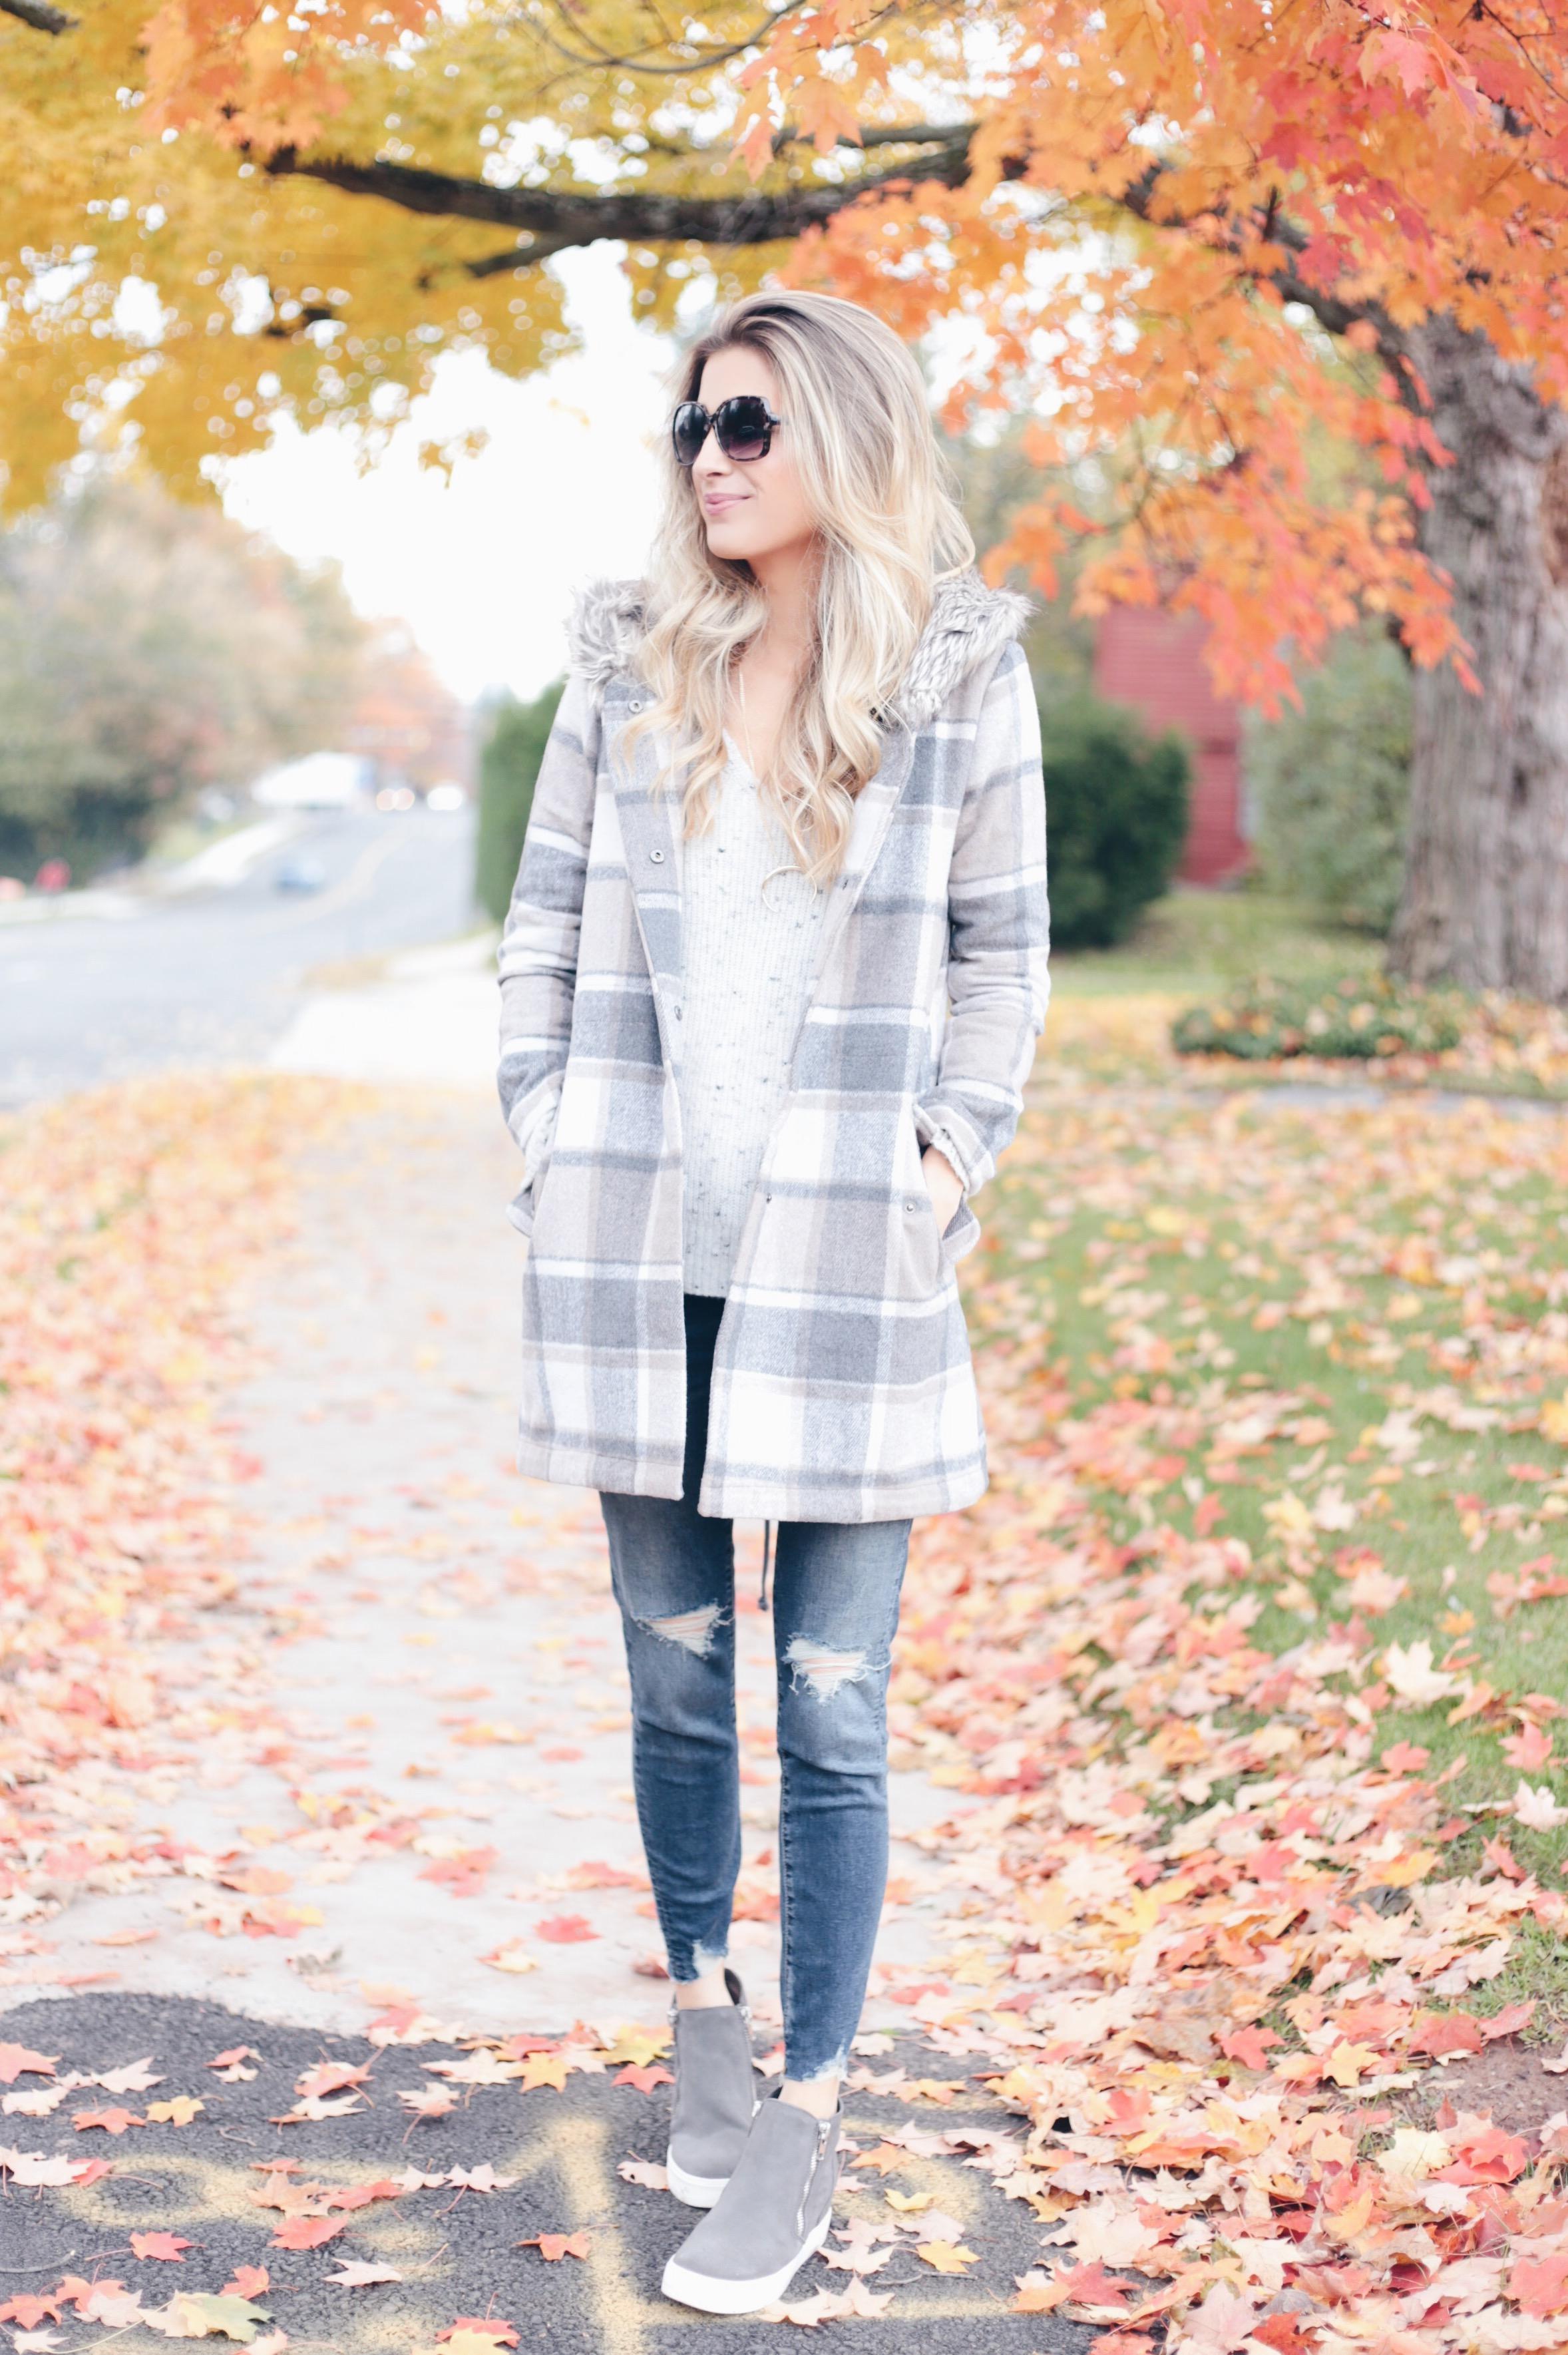 statement fall outerwear - neutral plaid fall jacket on pinteresting plans fashion blog